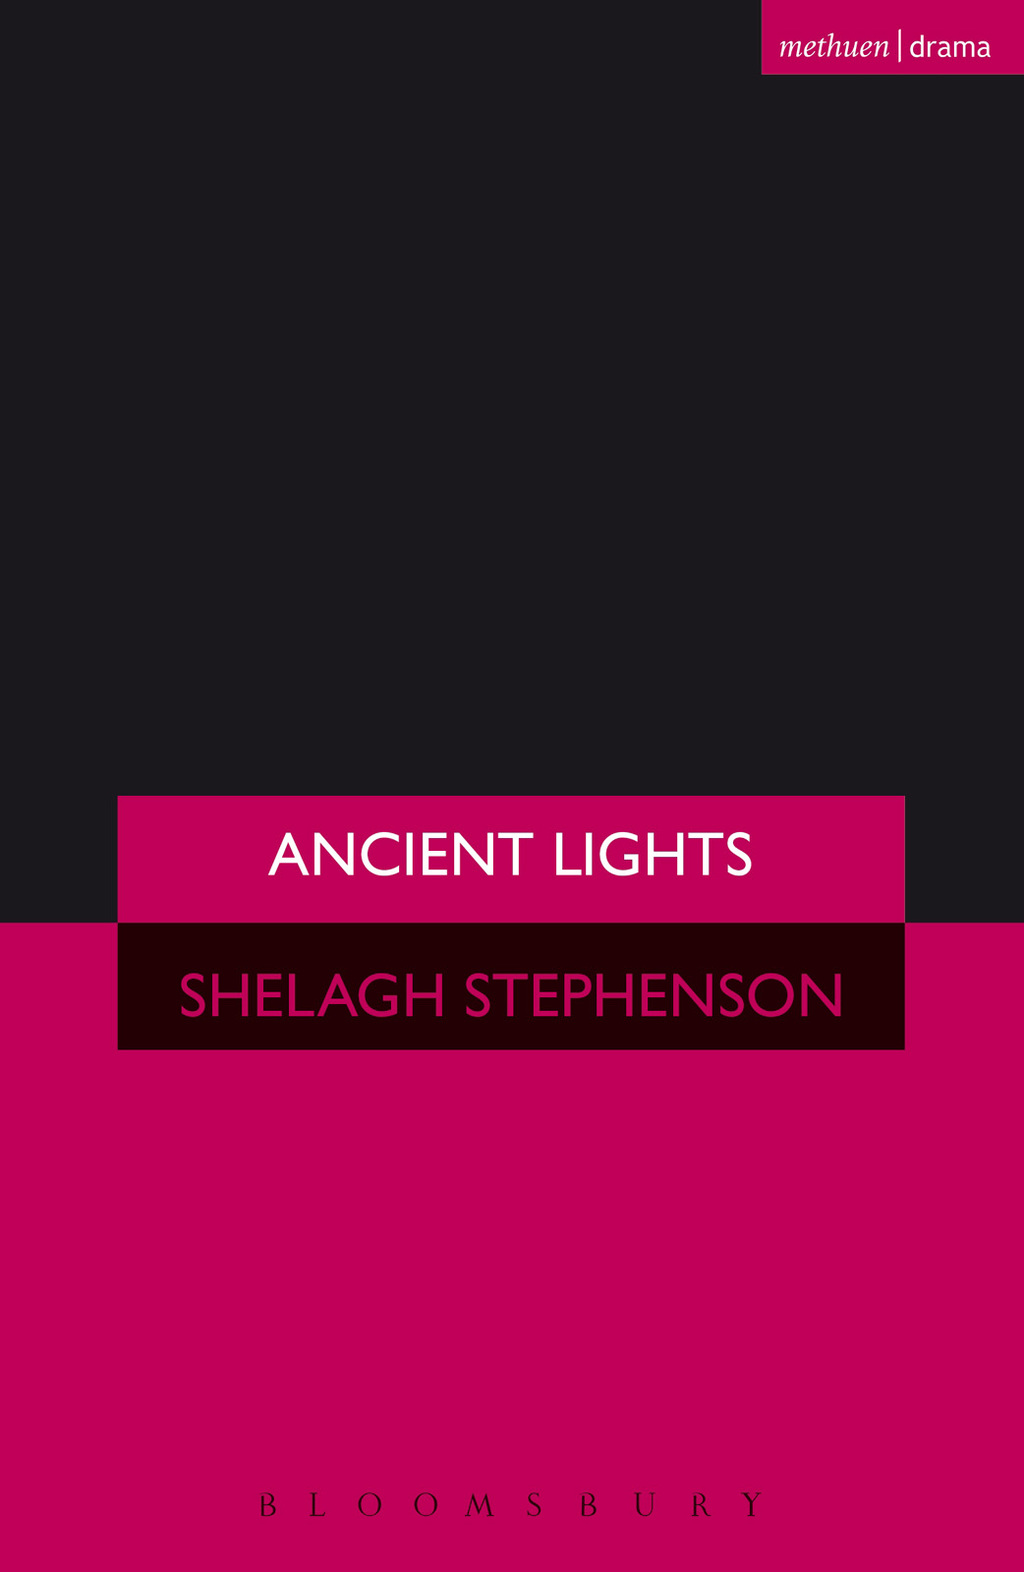 By Shelagh Stephenson PRINTISBN: 9780413760708 E-TEXT ISBN: 9781408148327 Edition: 1